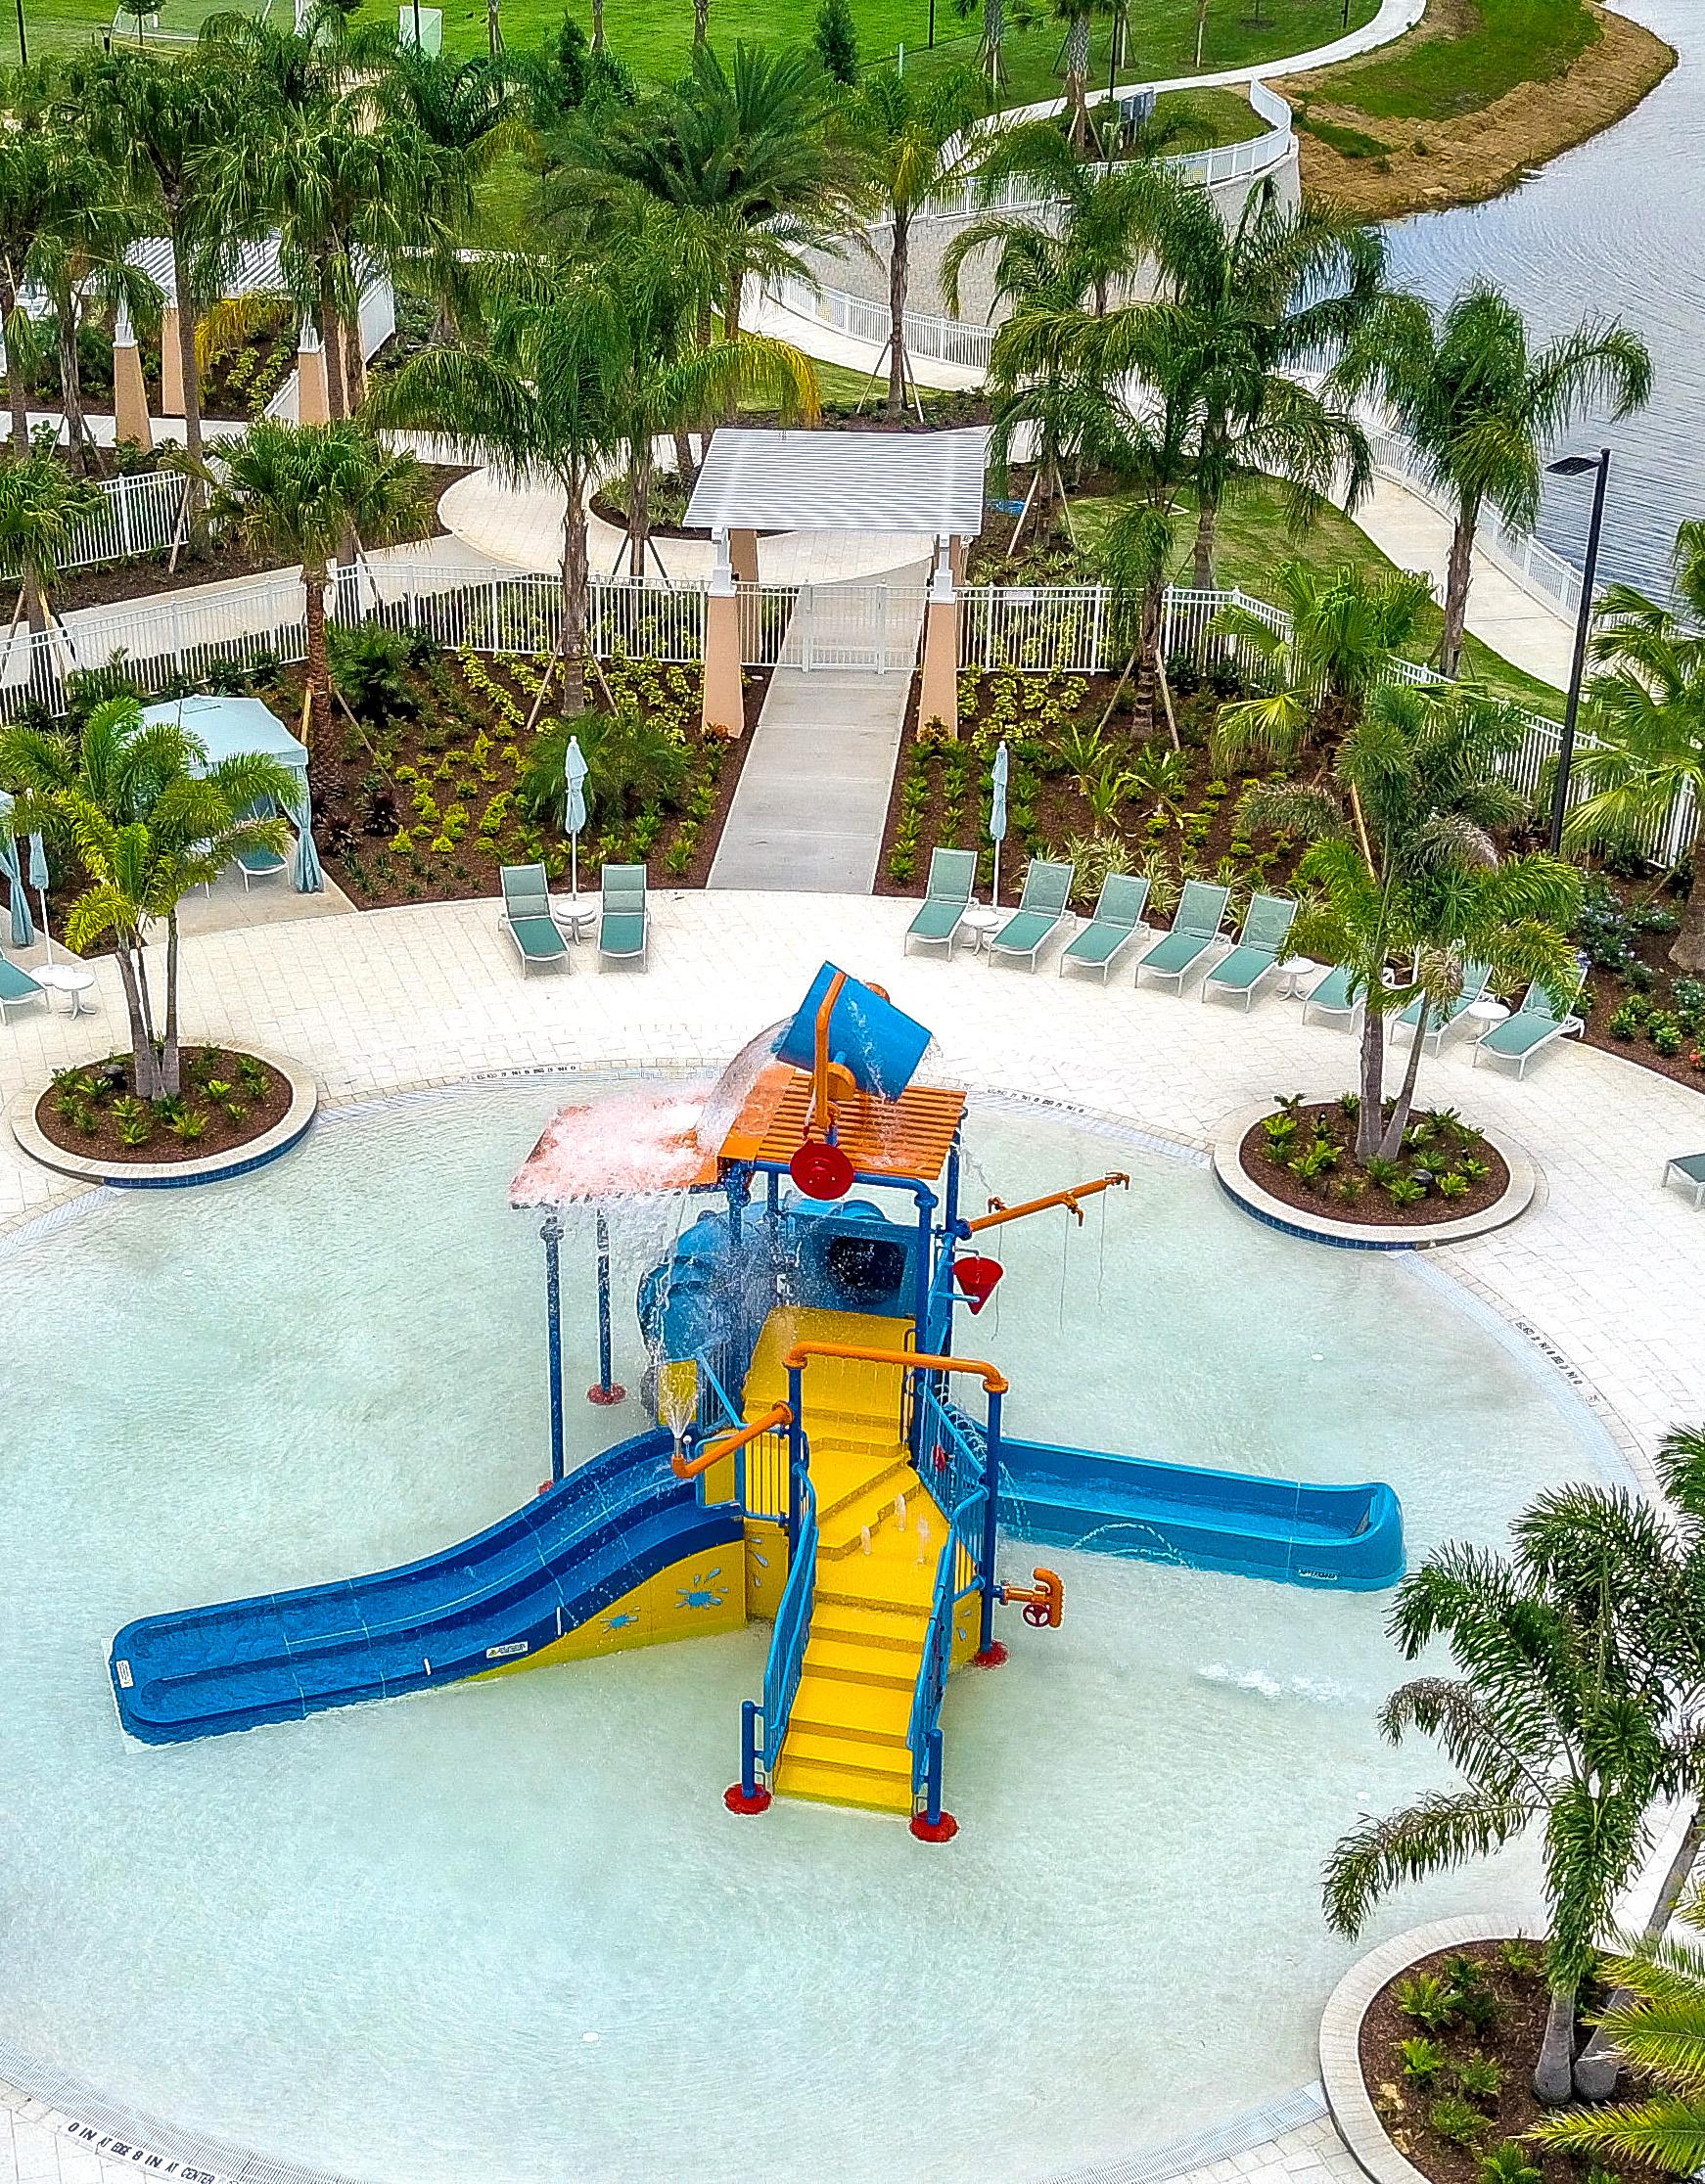 skyview image of Solara Resort